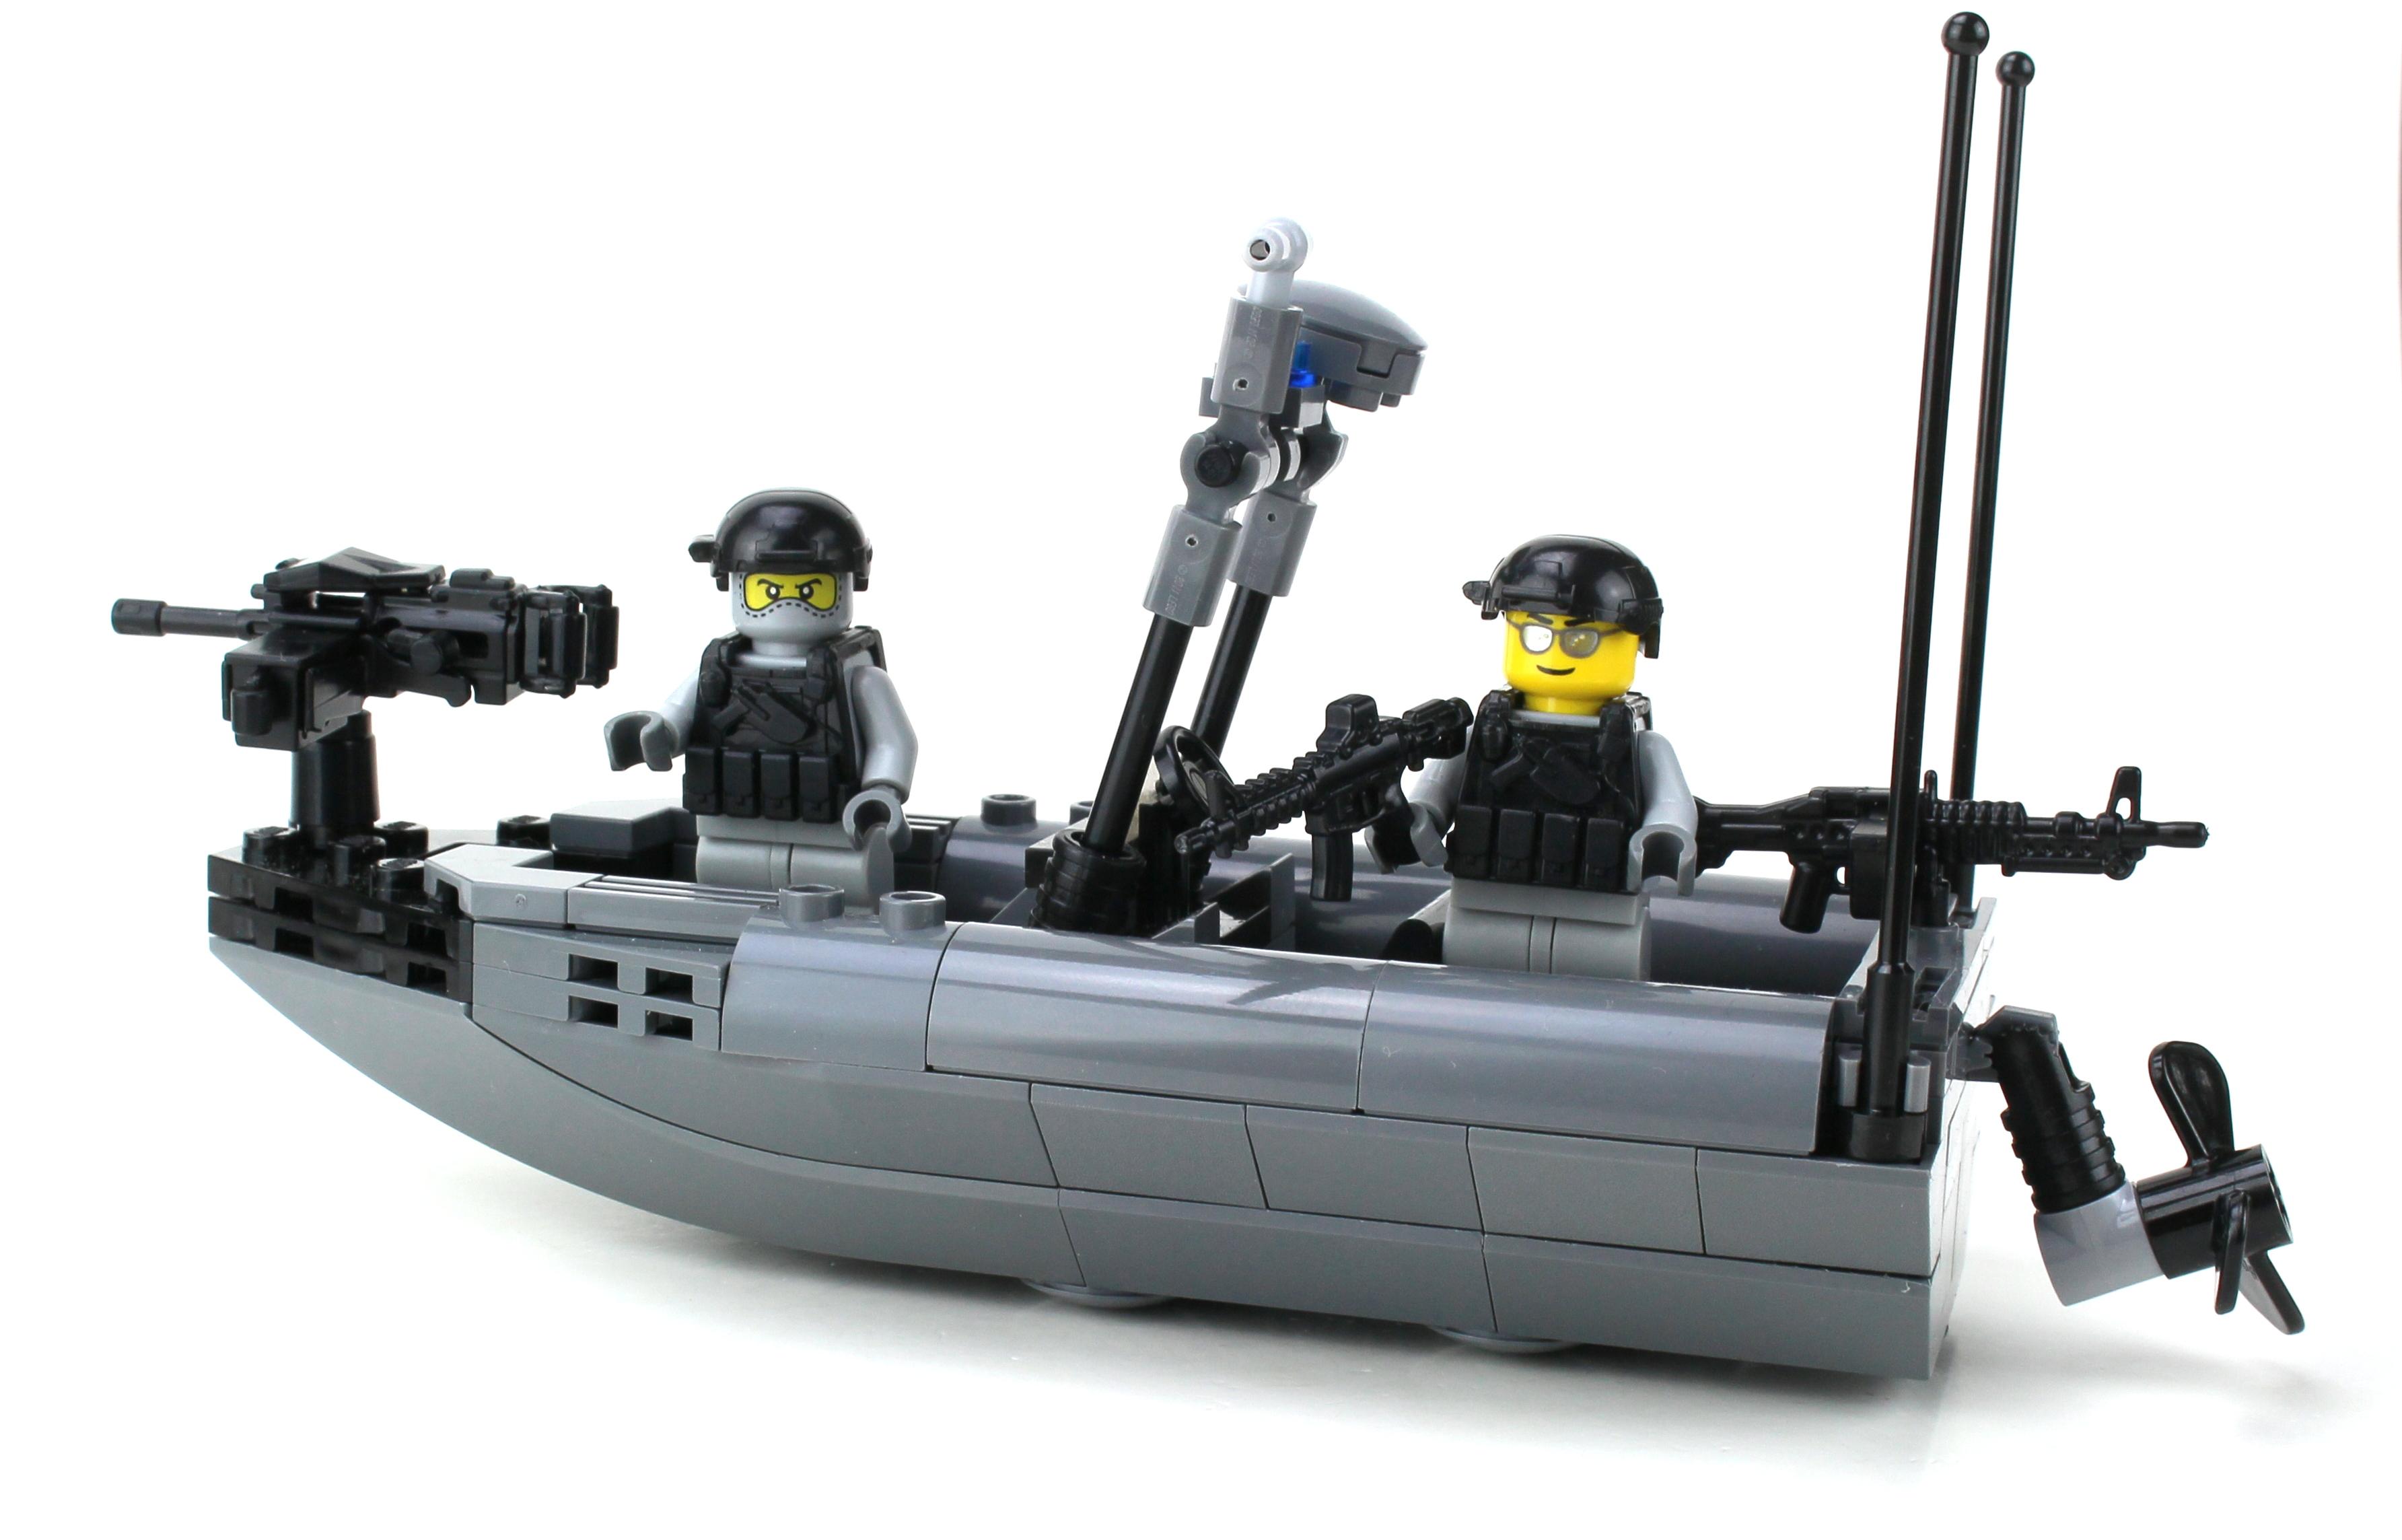 Navy Seal Rhib Attack Boat Made With Real Lego 194 174 Bricks